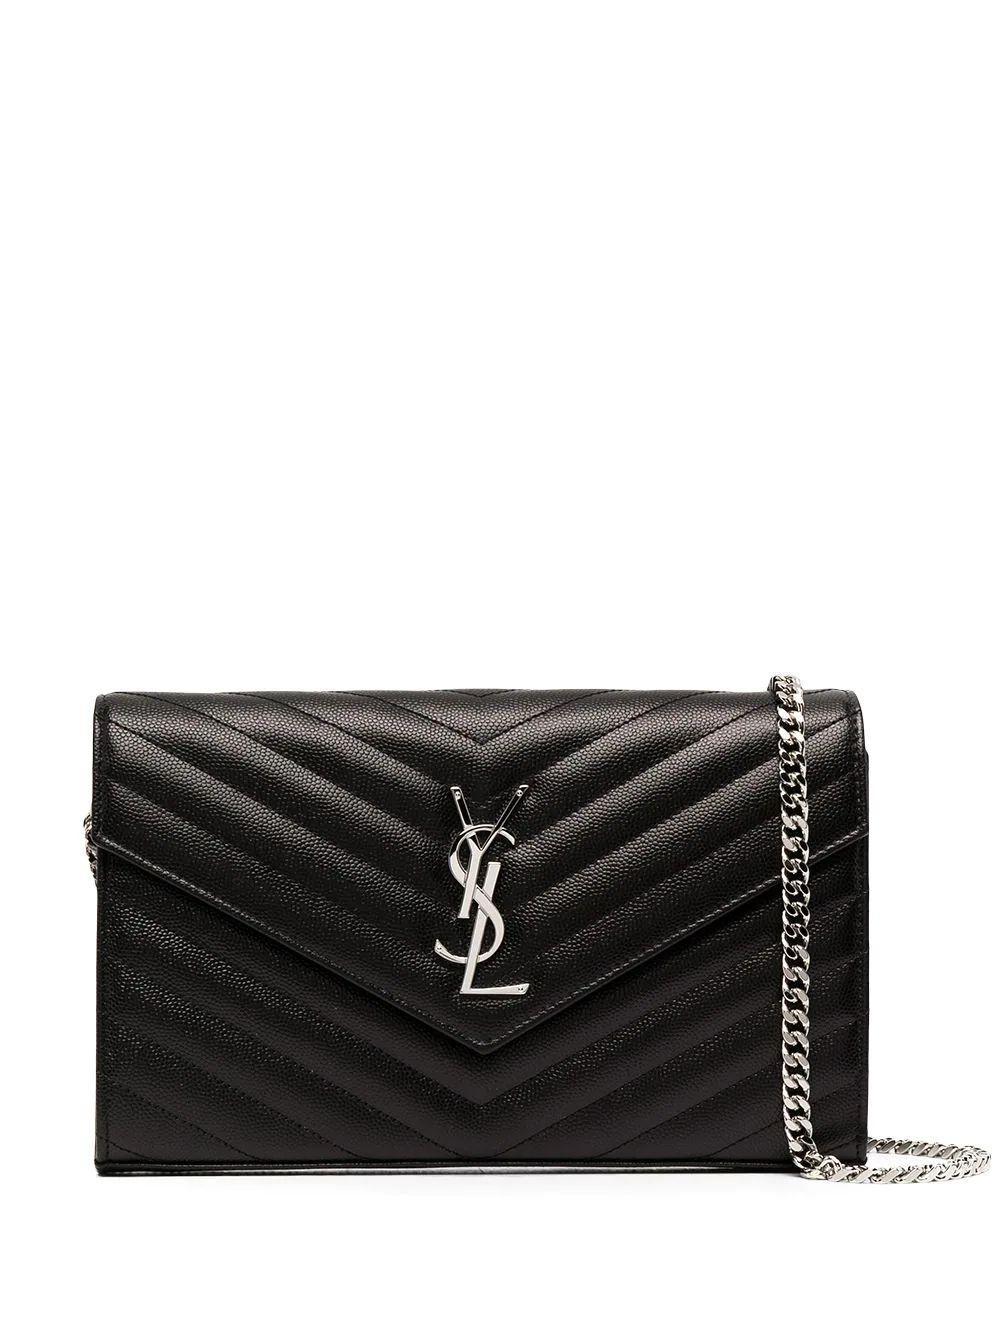 Monogram Wallet On A Chain Crossbody Bag Item # 377828BOW02